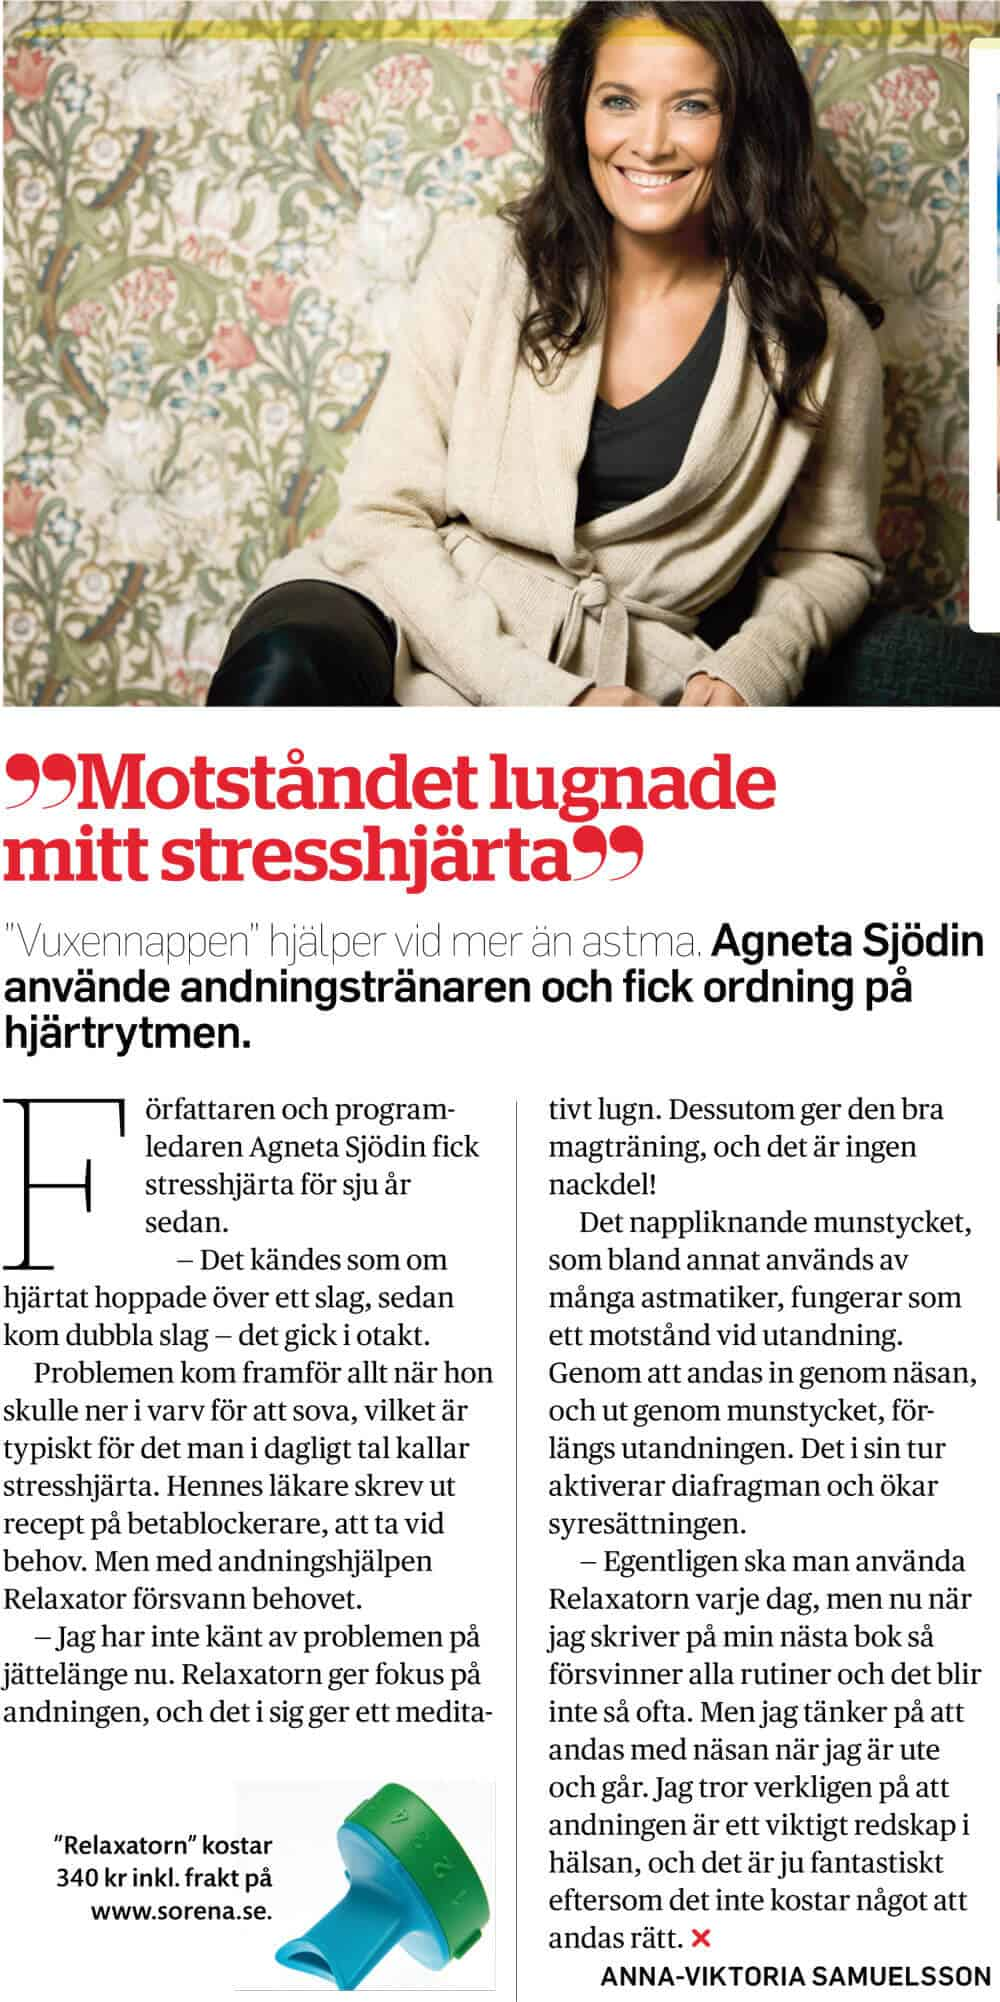 Agneta Sjödin: Relaxatorn lugnade mitt stresshjärta